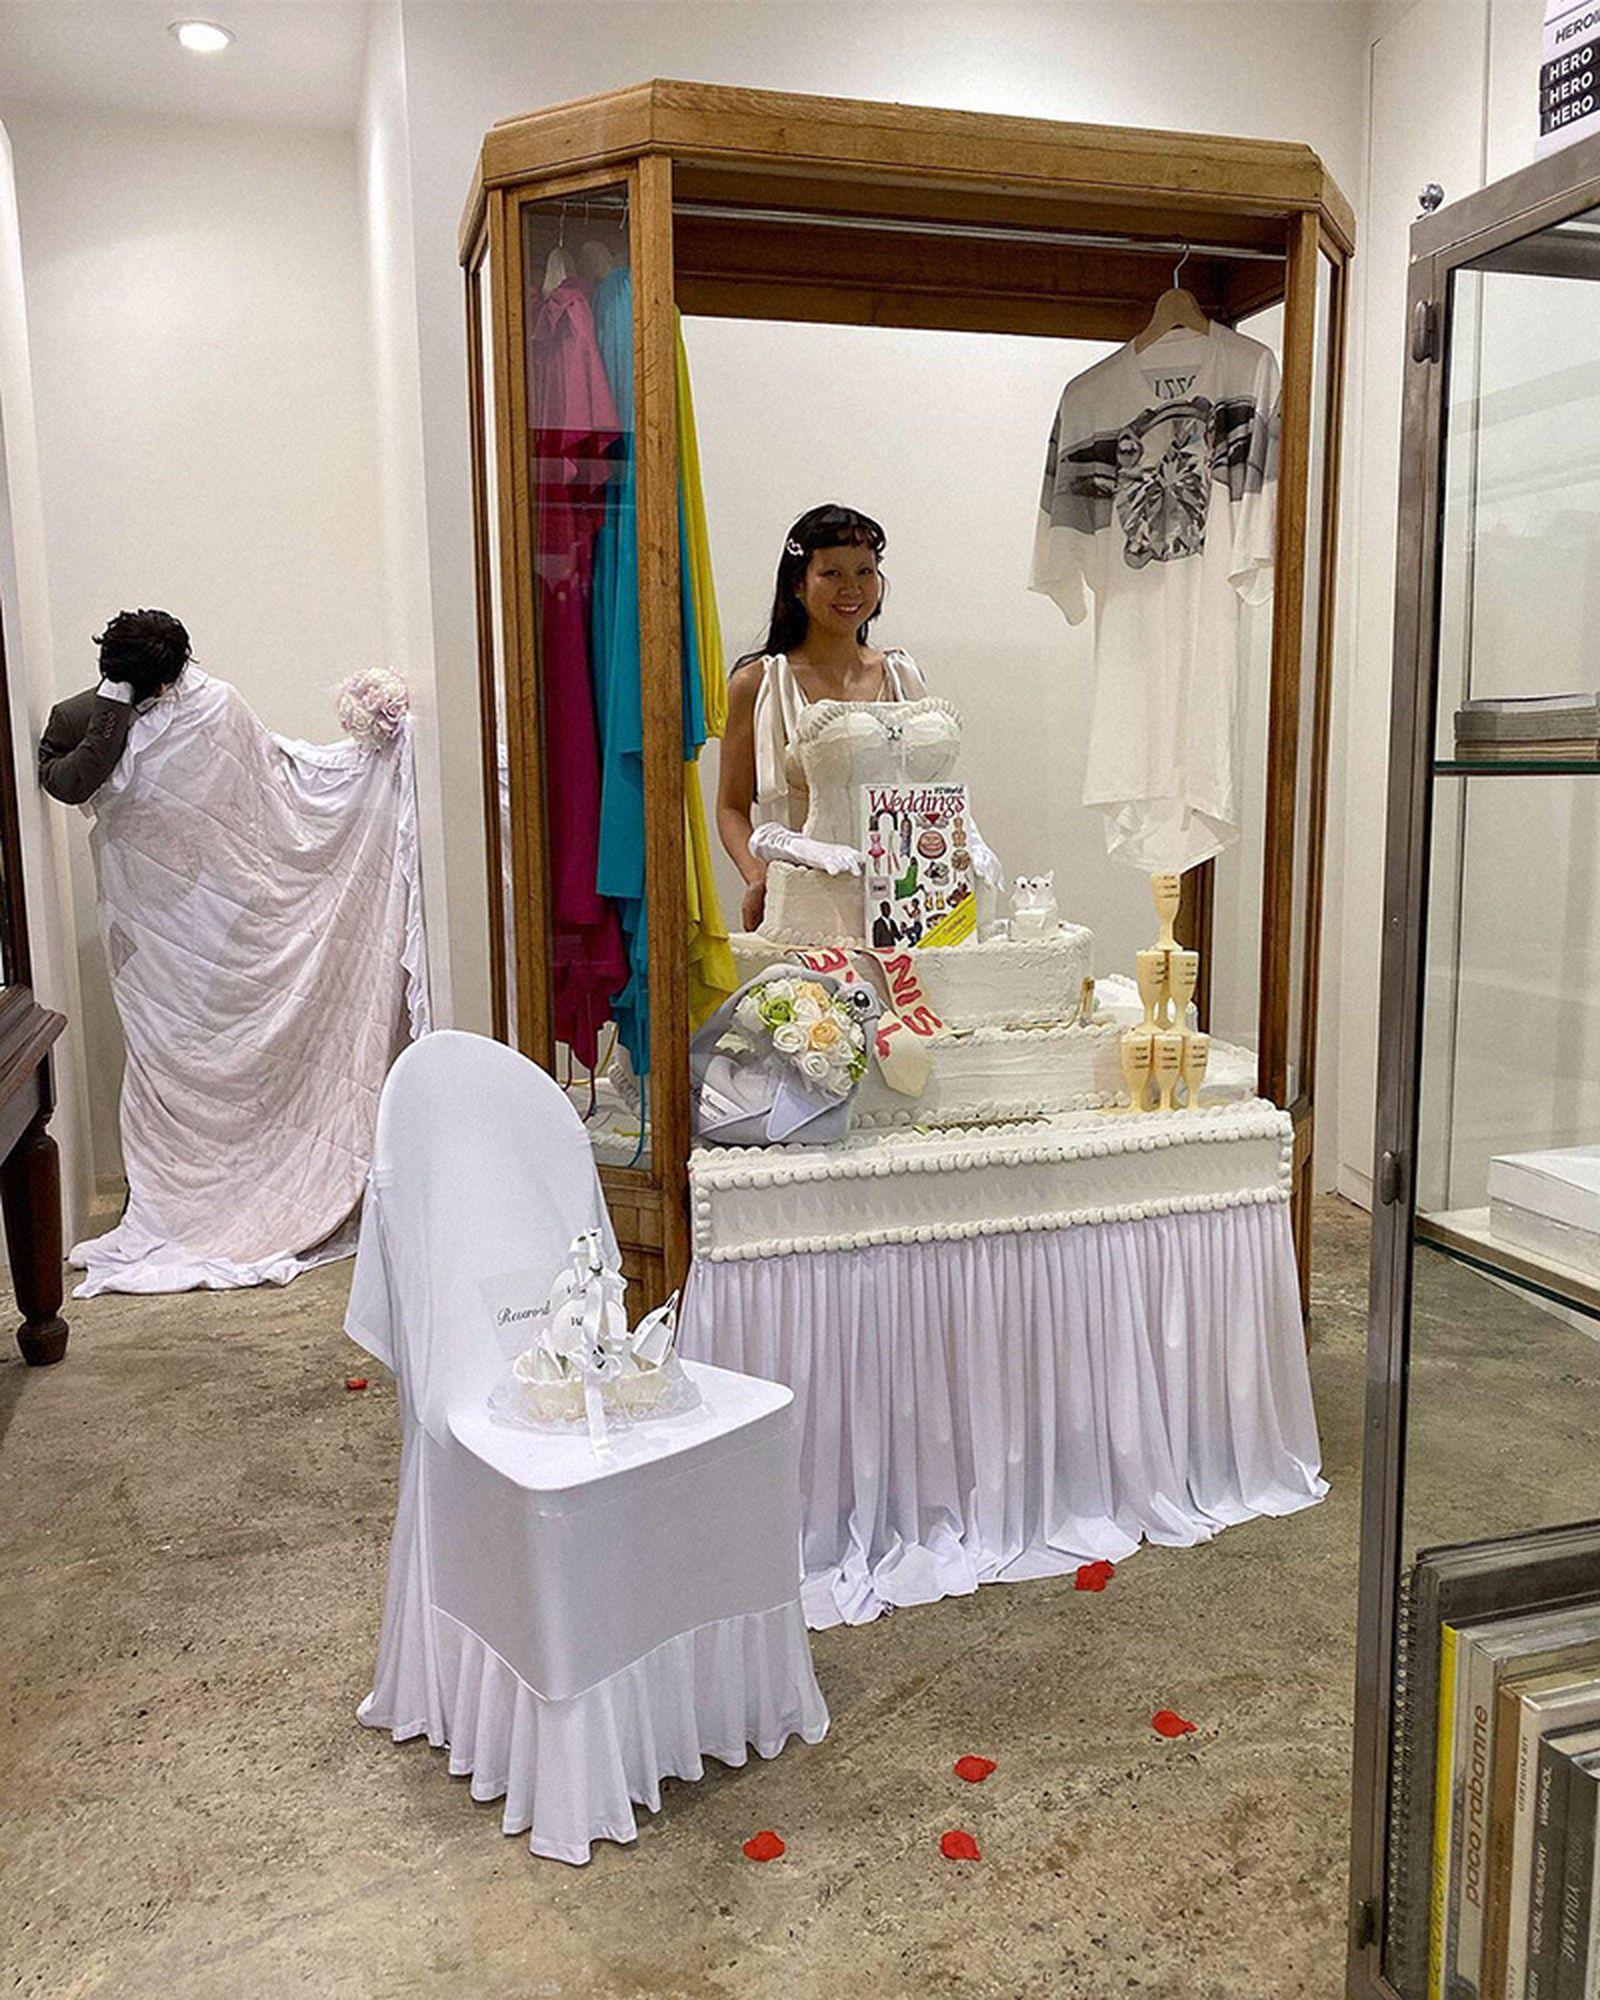 designer-pz-opassuksatit-weddings-love-working-vetements-06